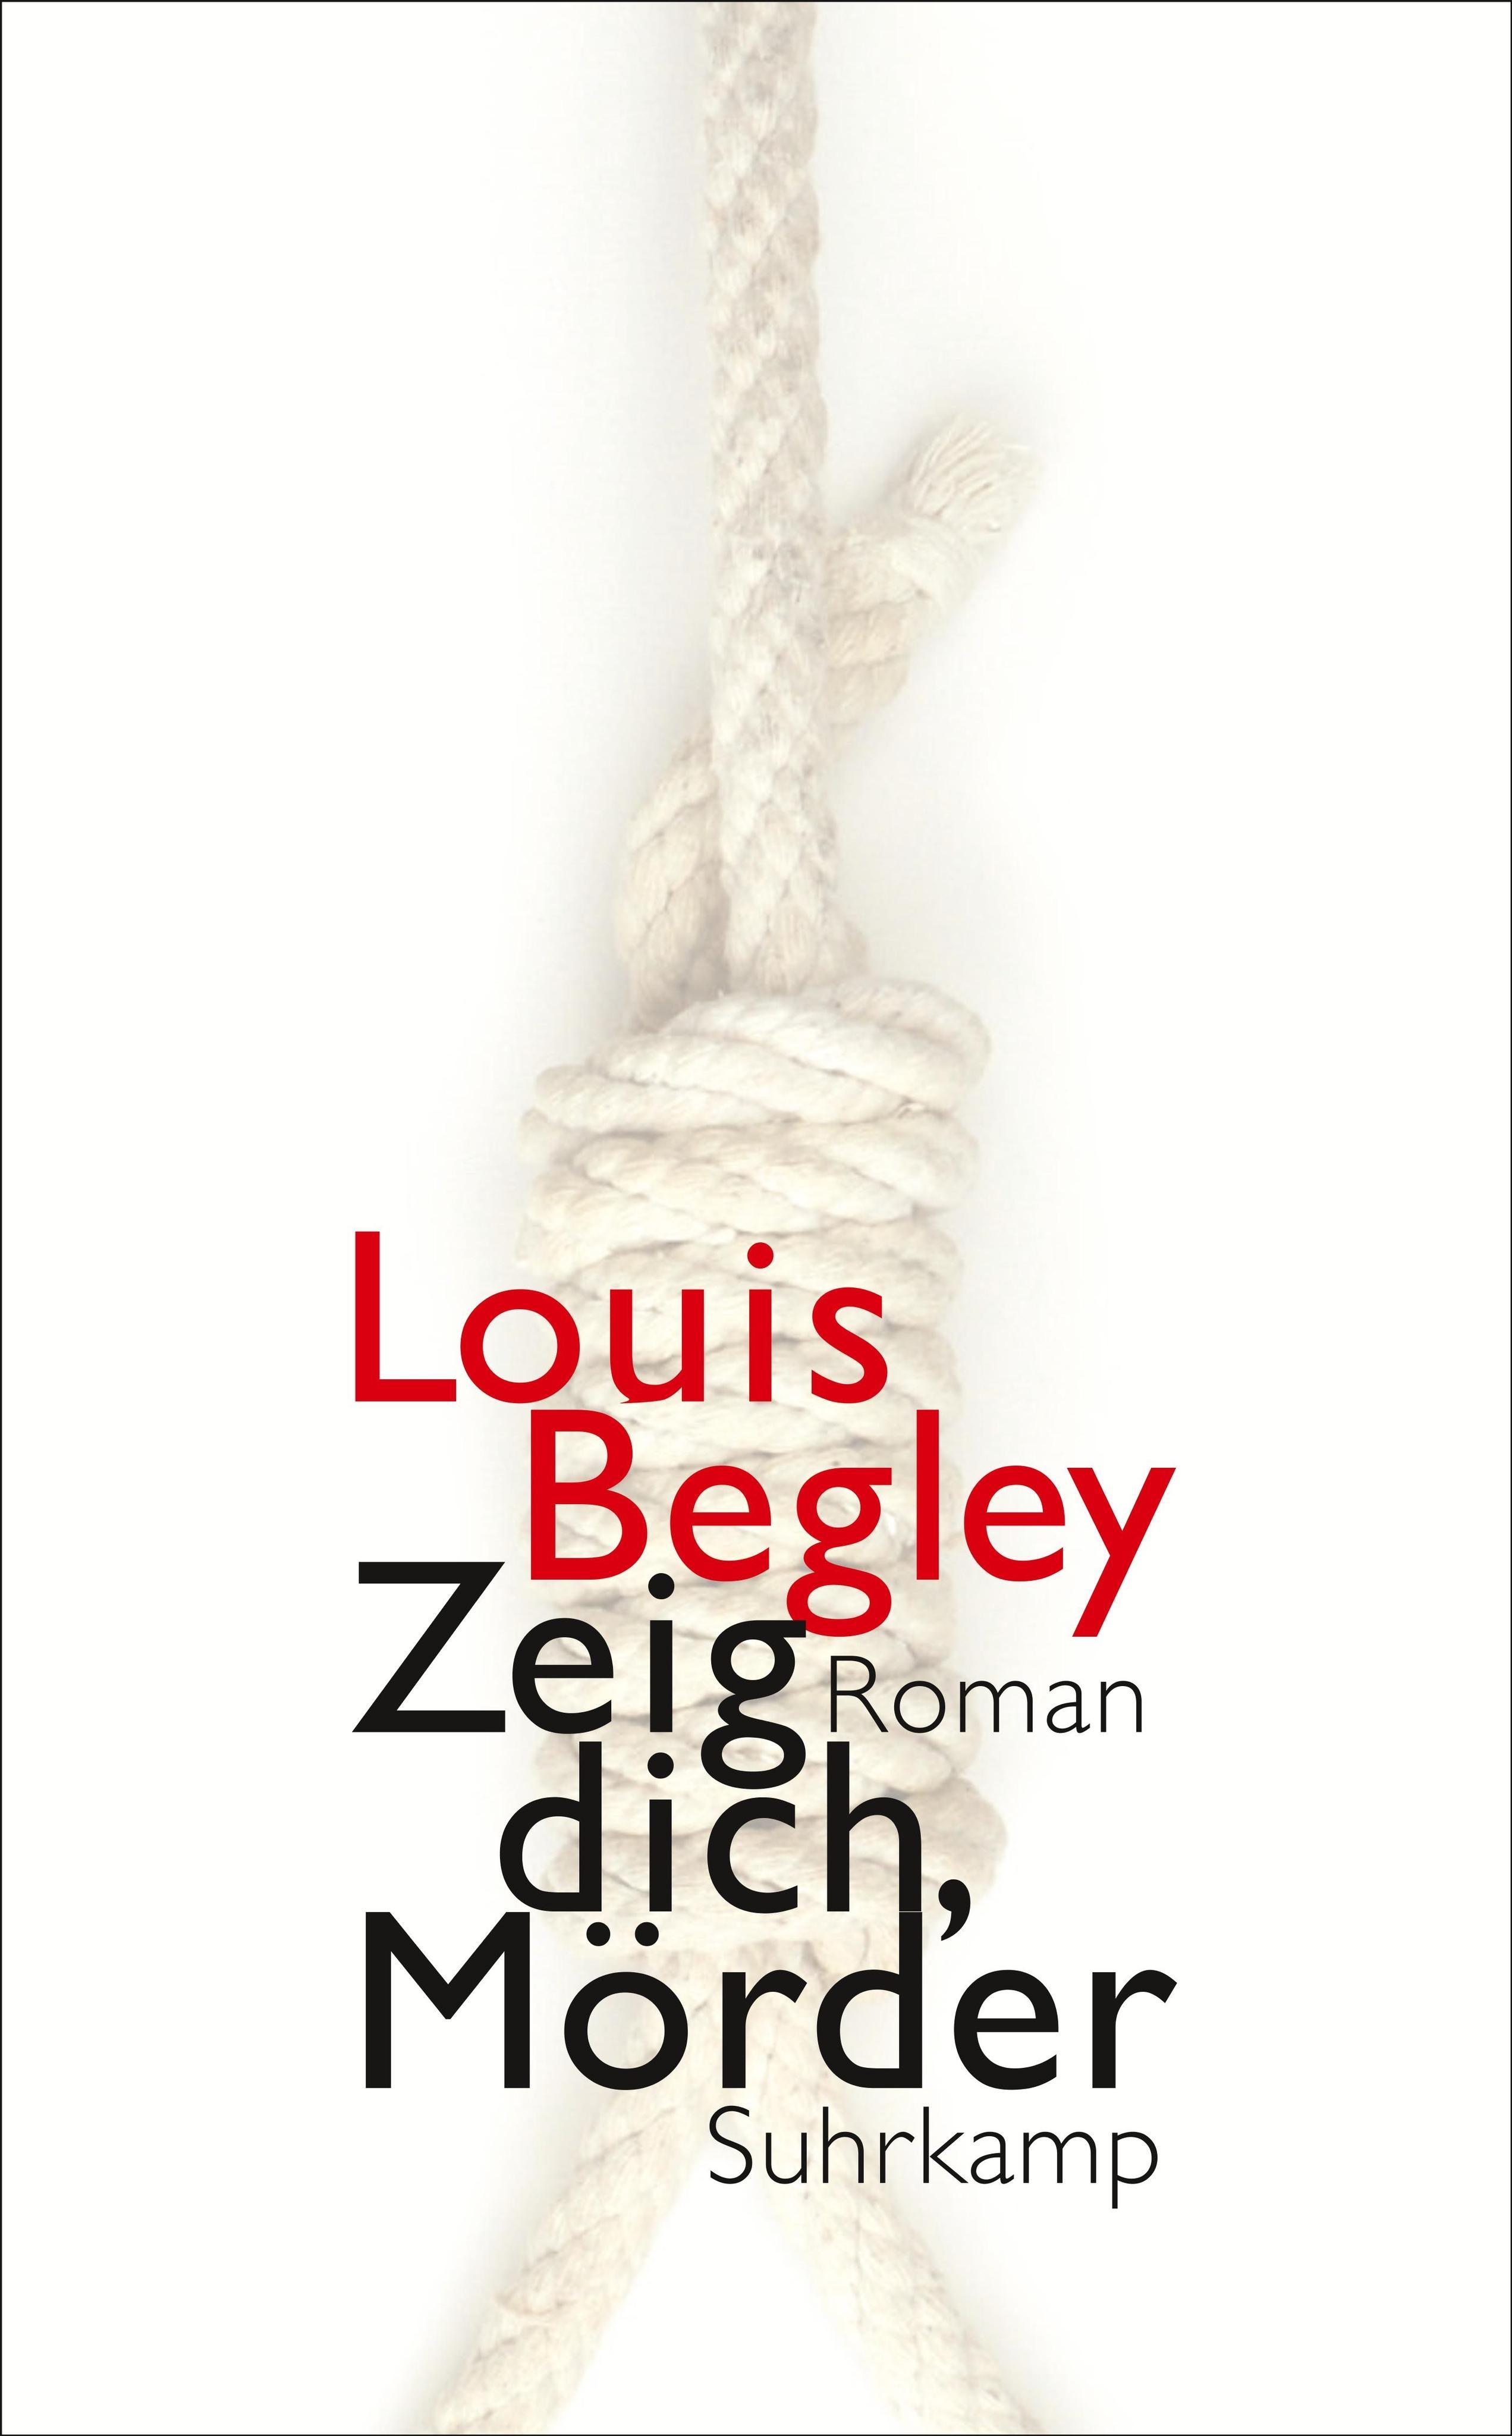 Zeig-dich-Moerder-Louis-Begley